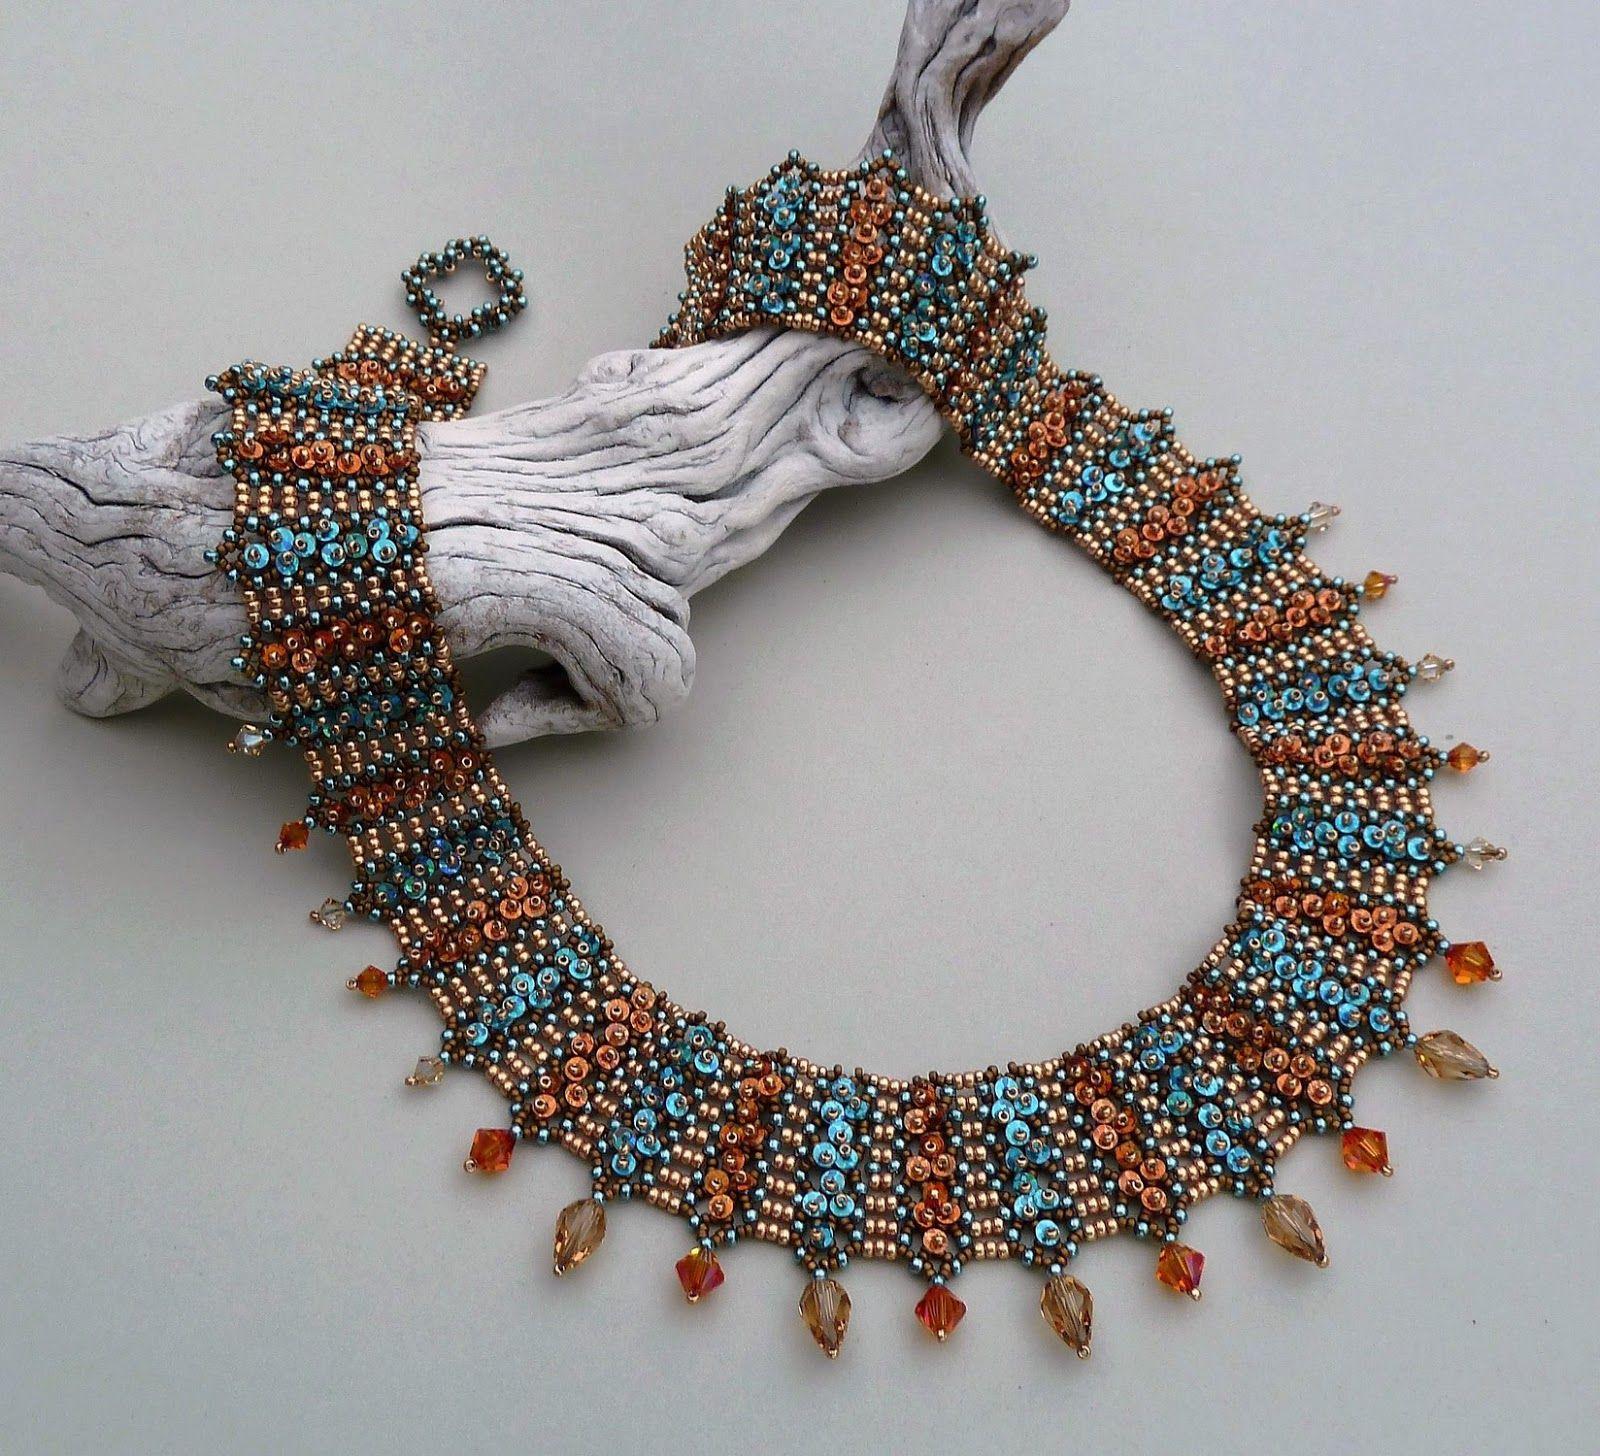 Mariposas treasure chest: Dragonsong   takı   Pinterest   Ketten ...